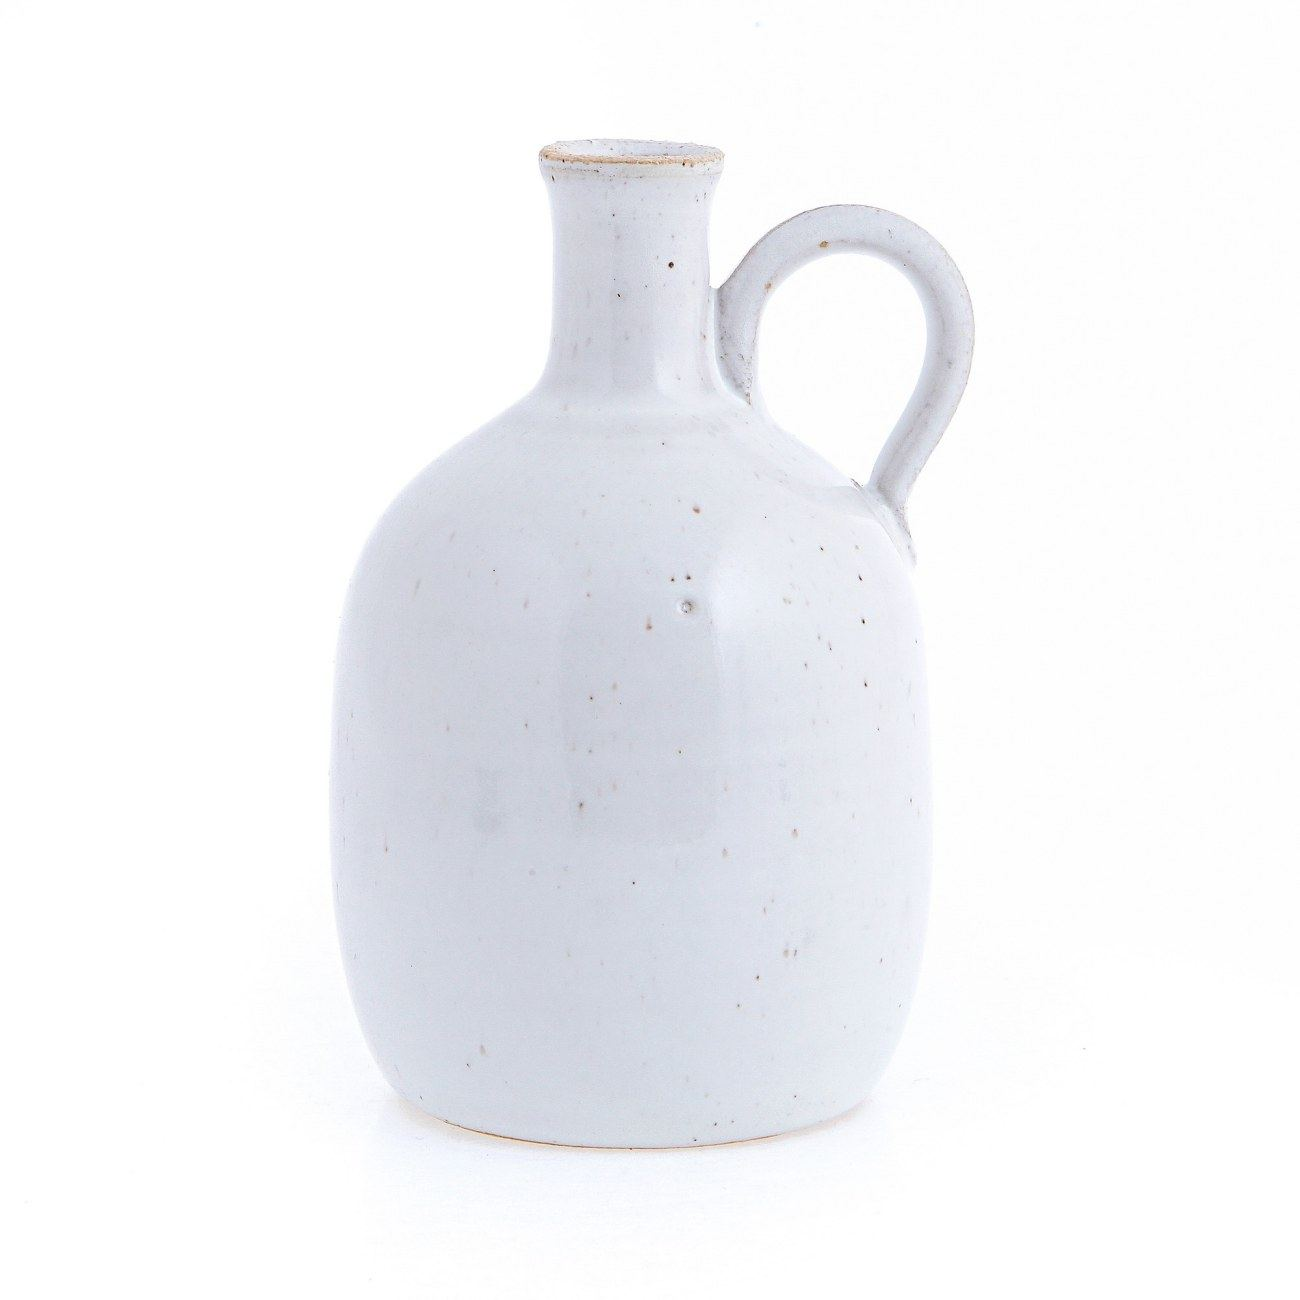 decanter and cups set ( piece) modern handmade ceramic serving  - liquor decanter and cups set ( piece) modern handmade ceramic servingpitcher with lid white